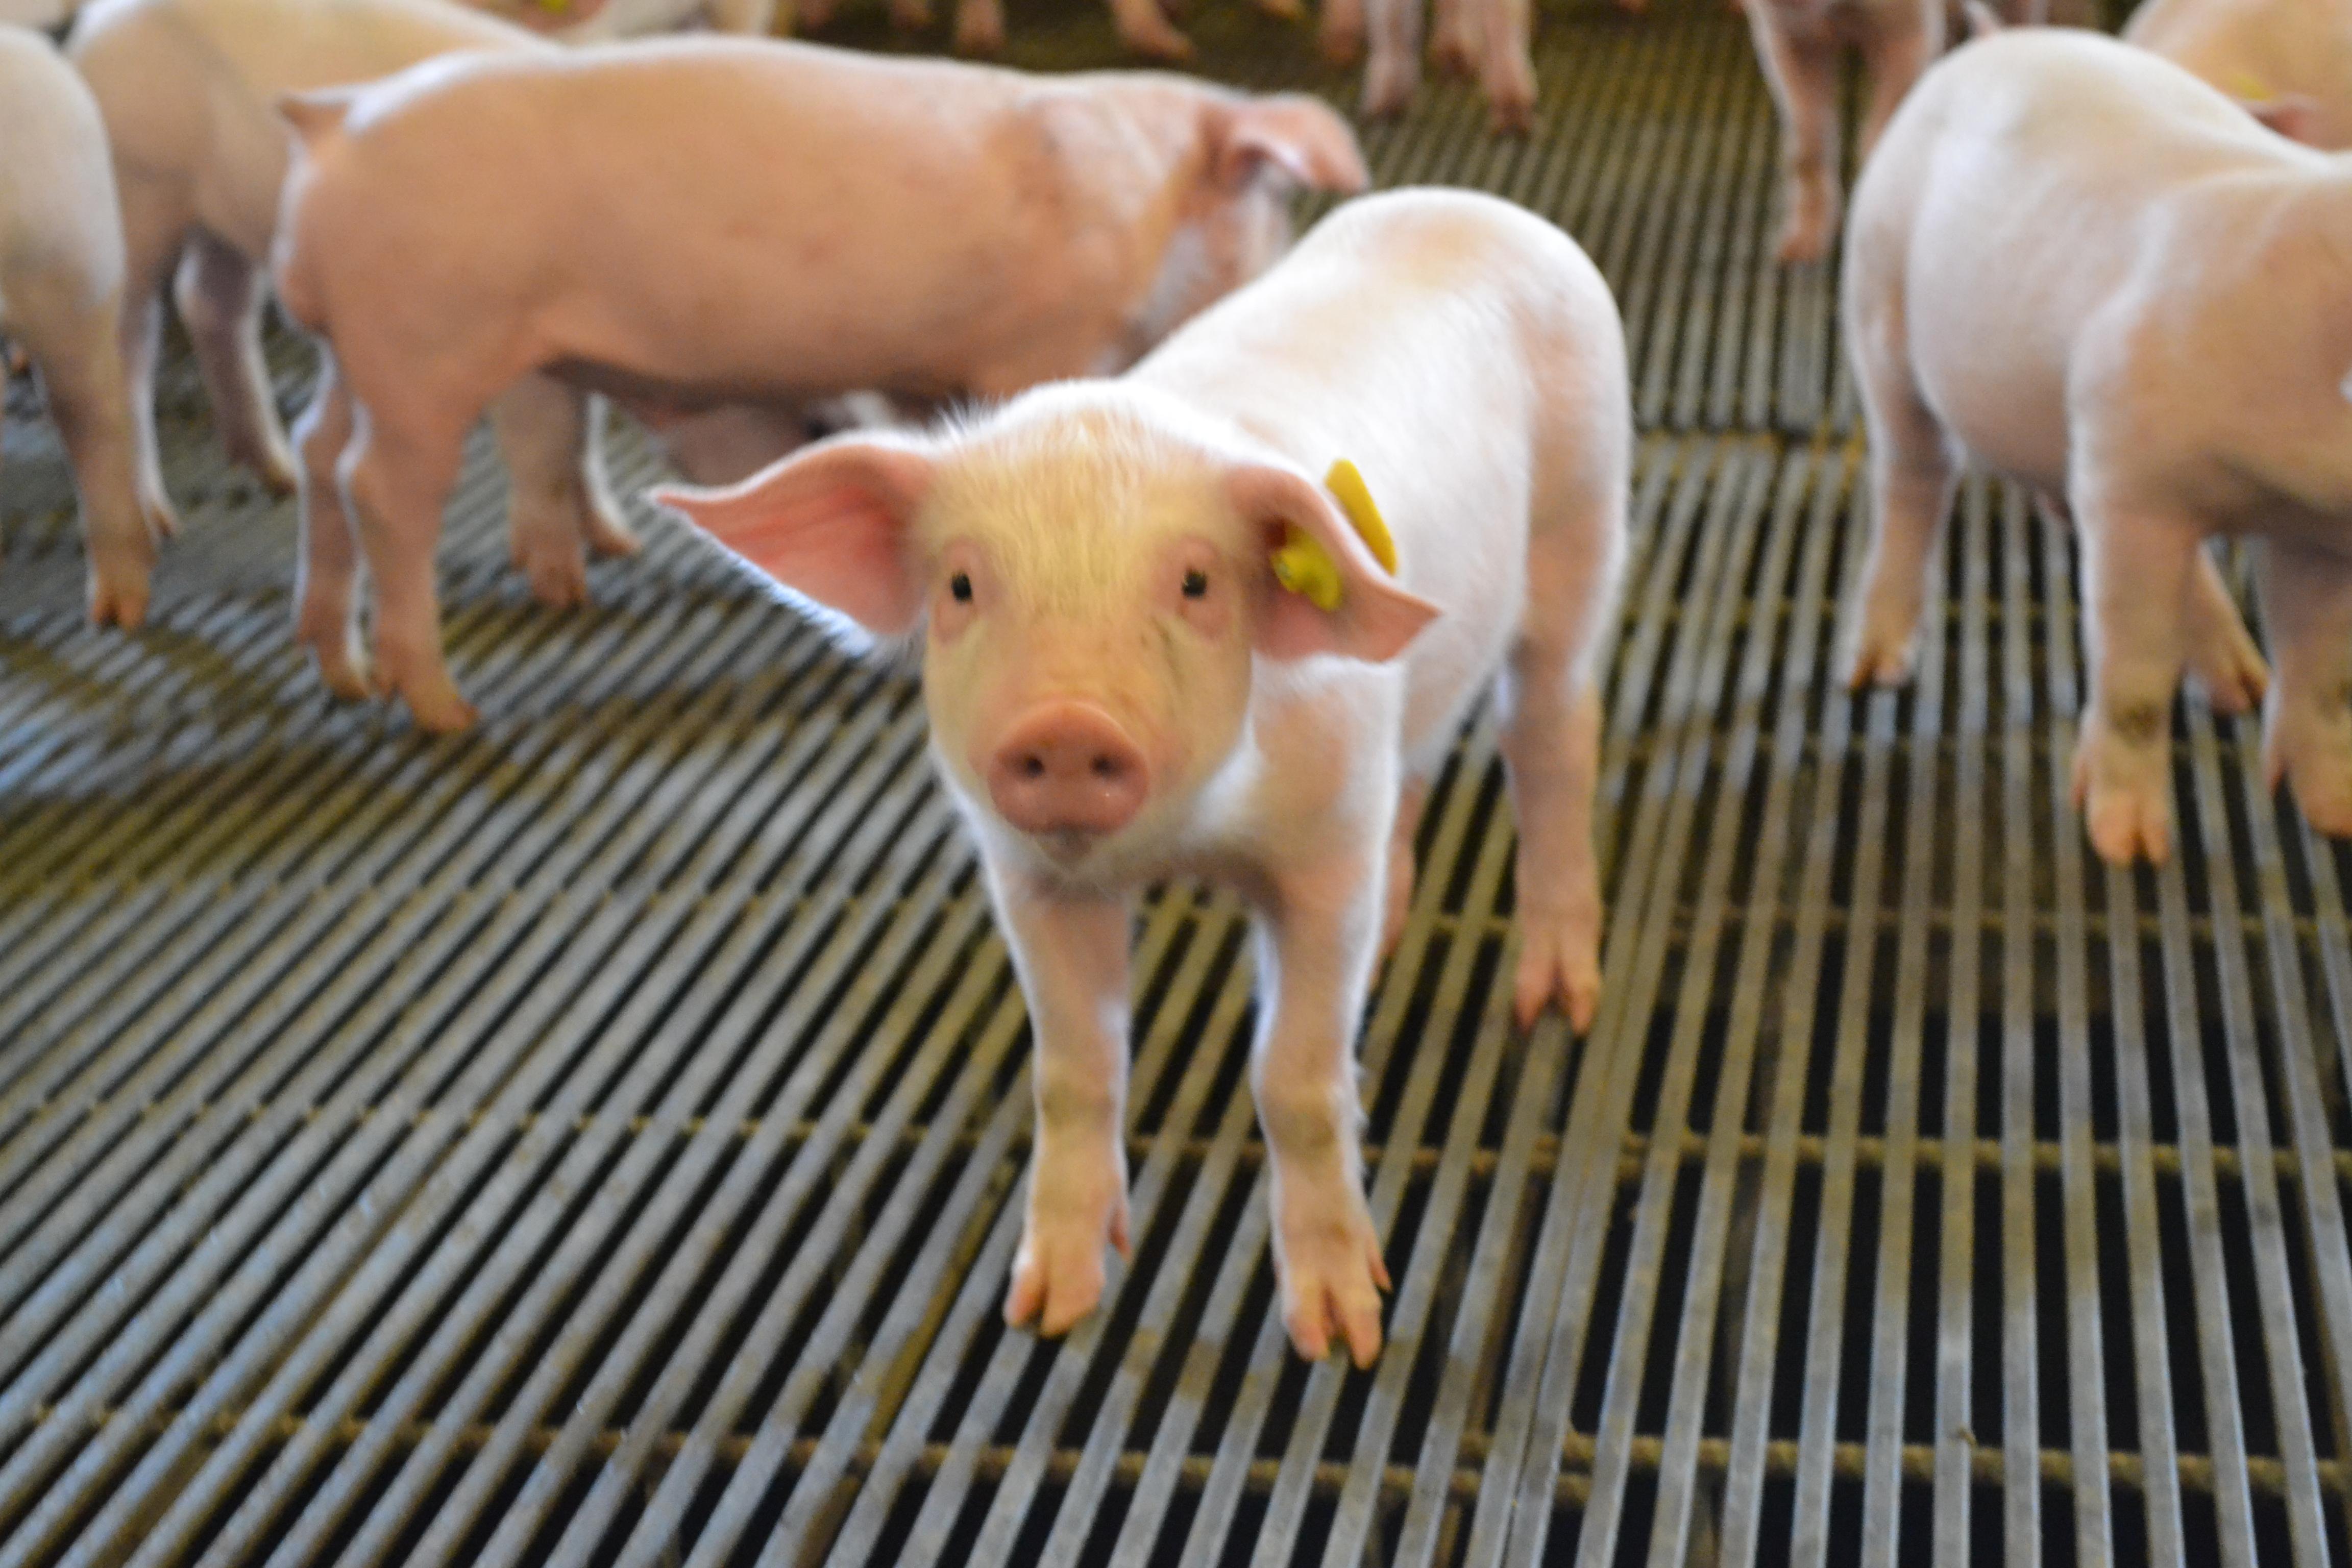 trip commercial corporation mats no floor pig mat pitches new